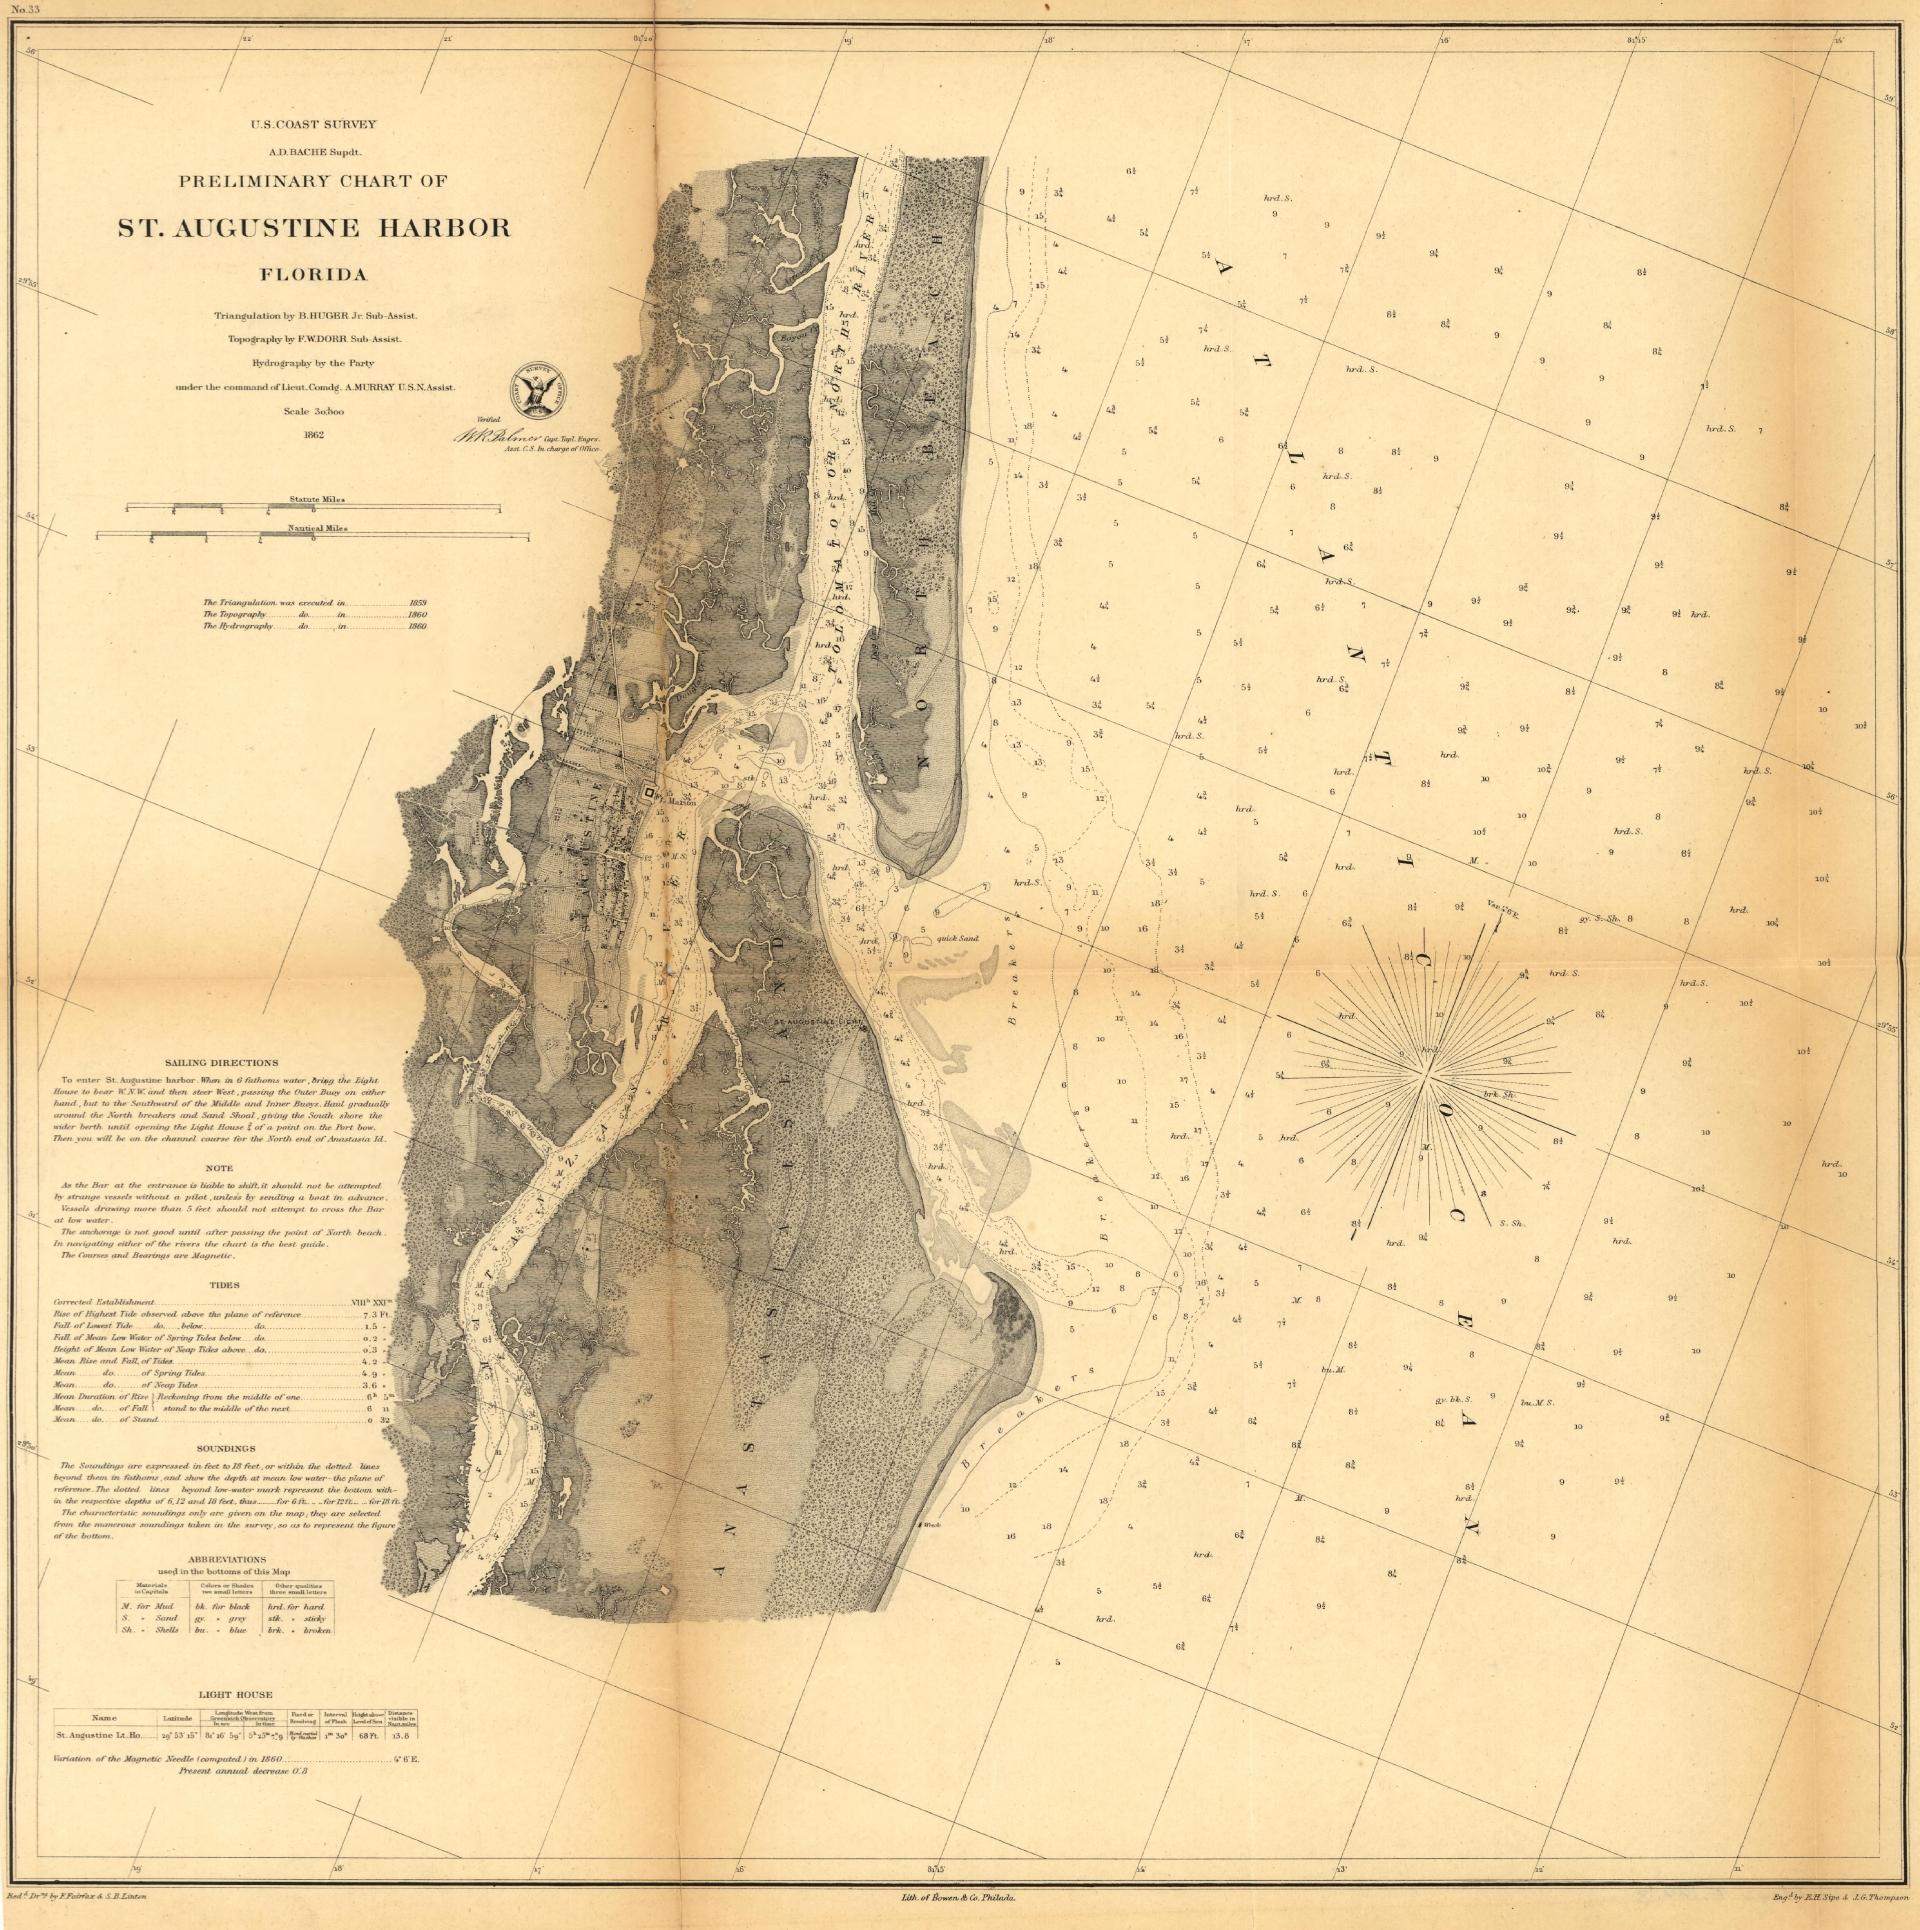 Preliminary chart of St. Augustine harbor, Florida Triangulation - U.S. Coast Survey - 1862